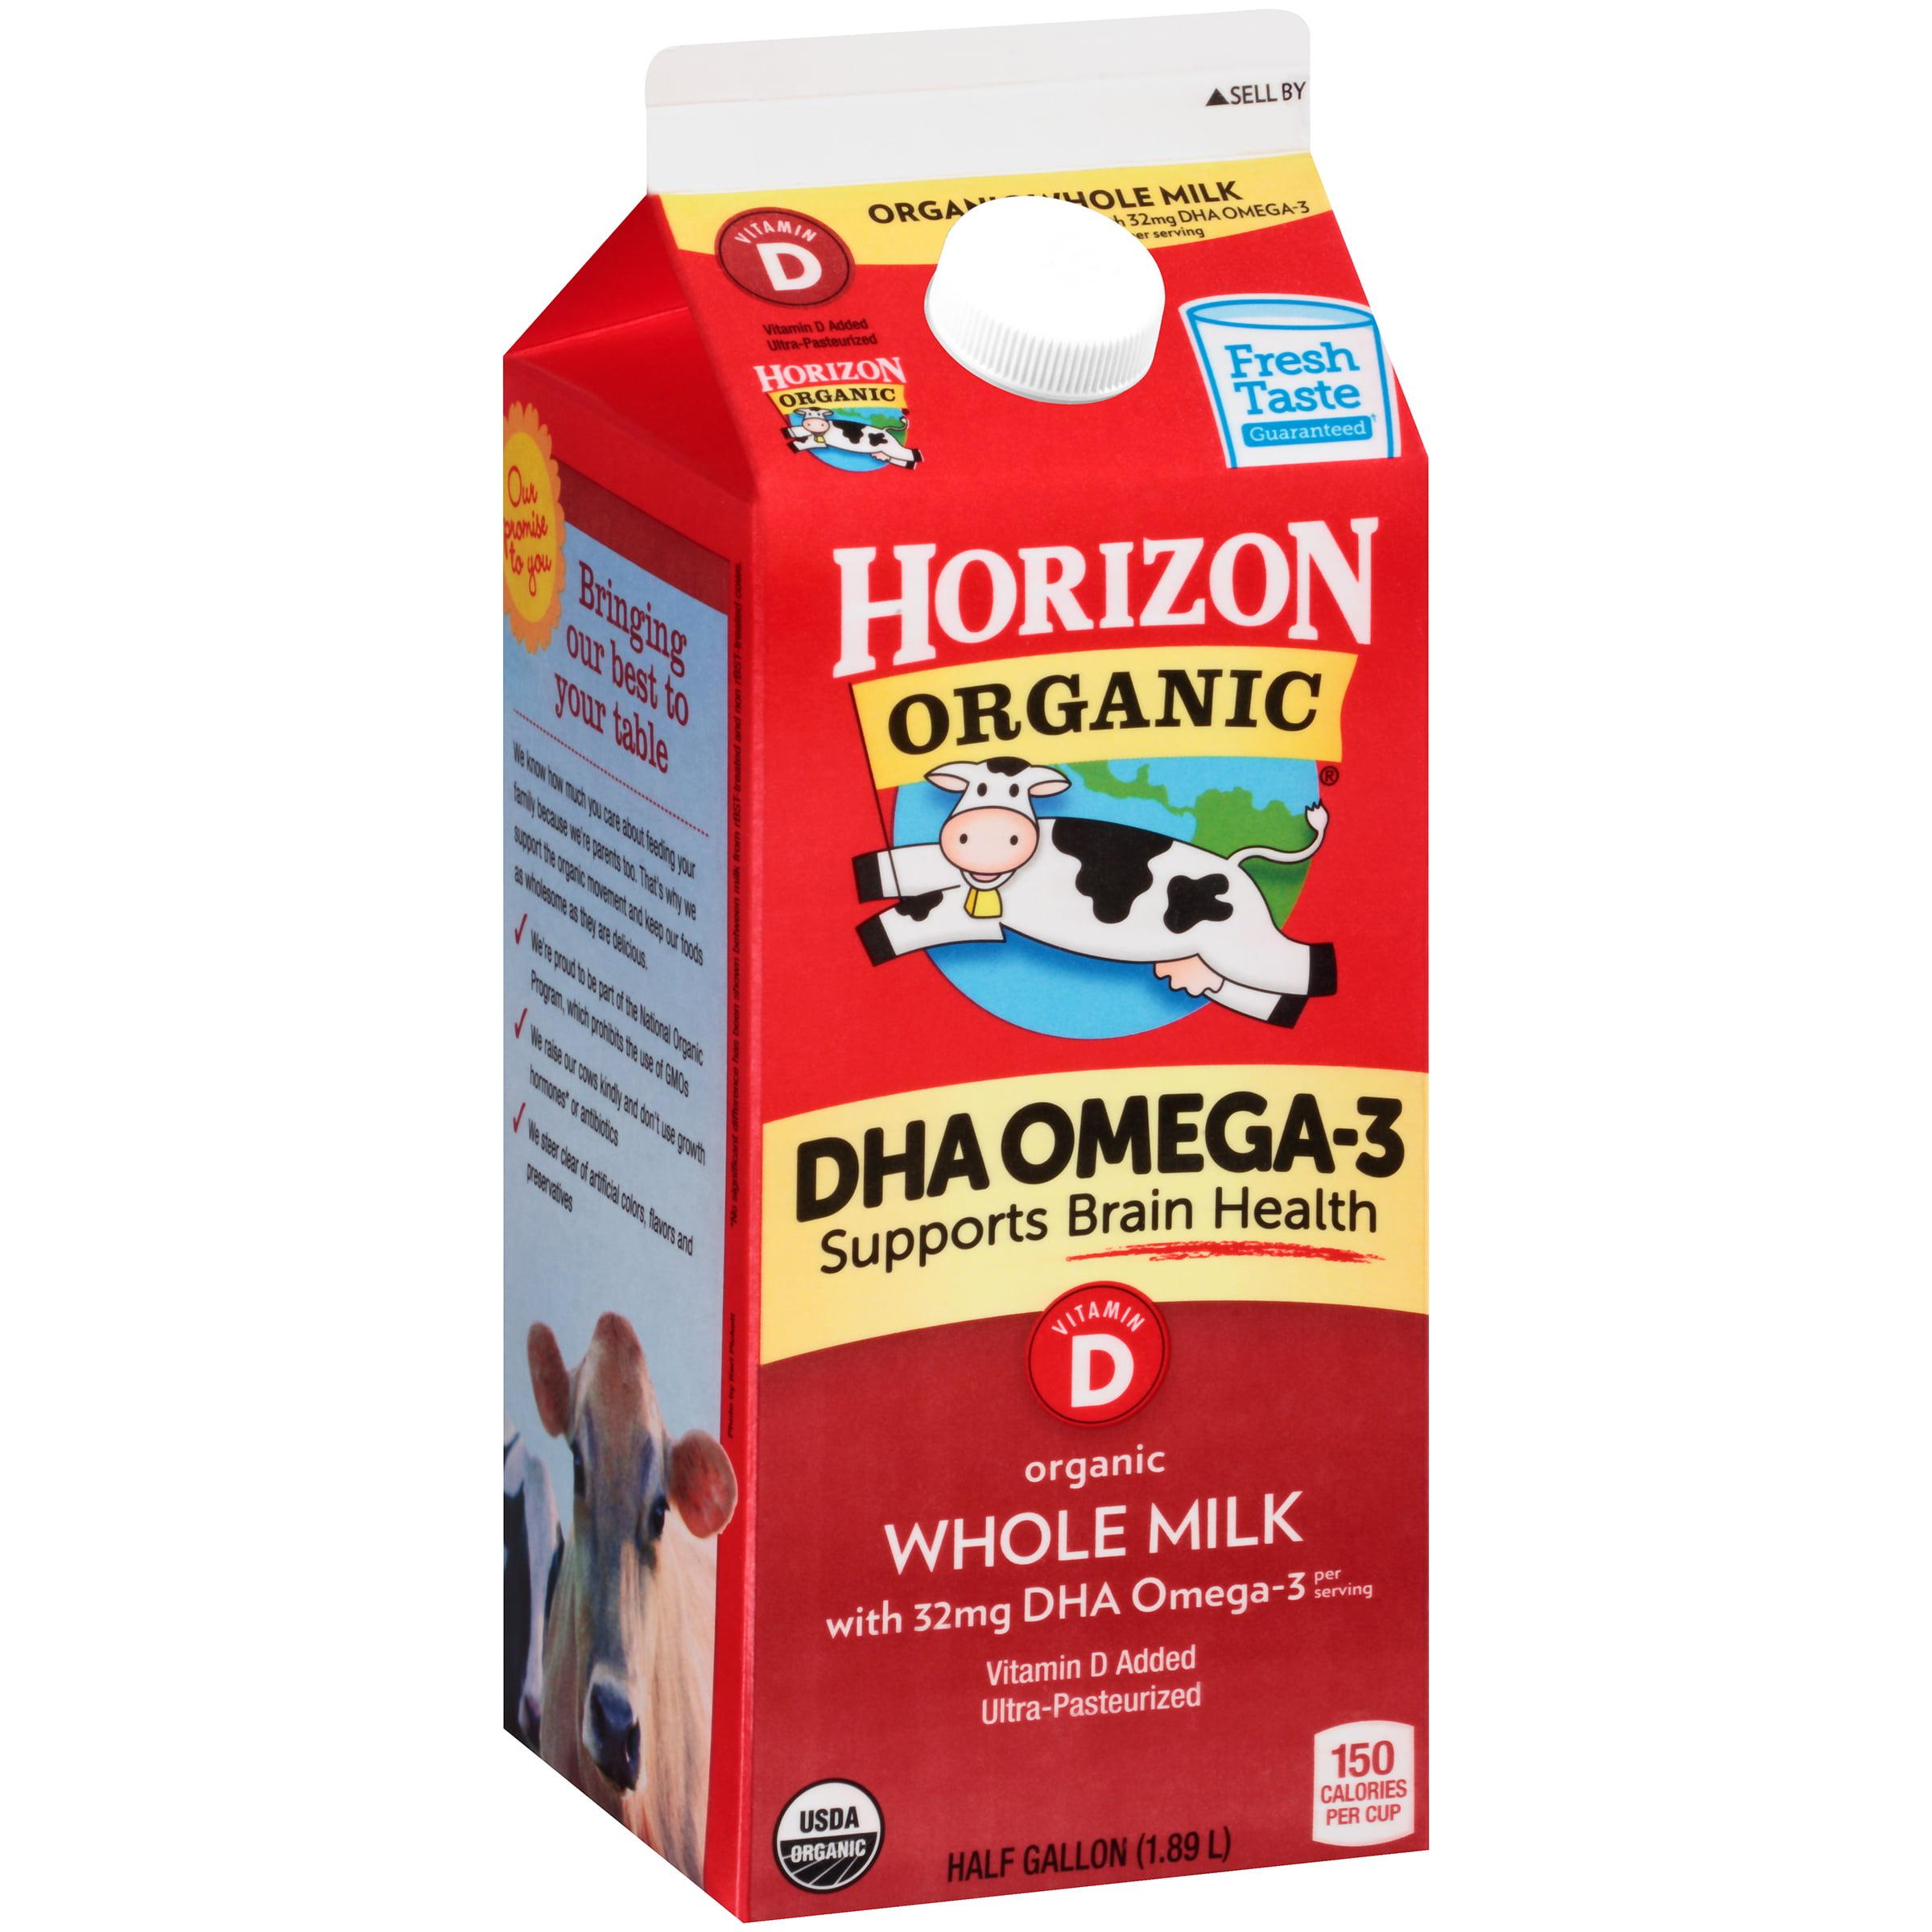 Horizon Organic�� Vitamin D DHA Omega-3 Organic Whole Milk .5 gal. Carton